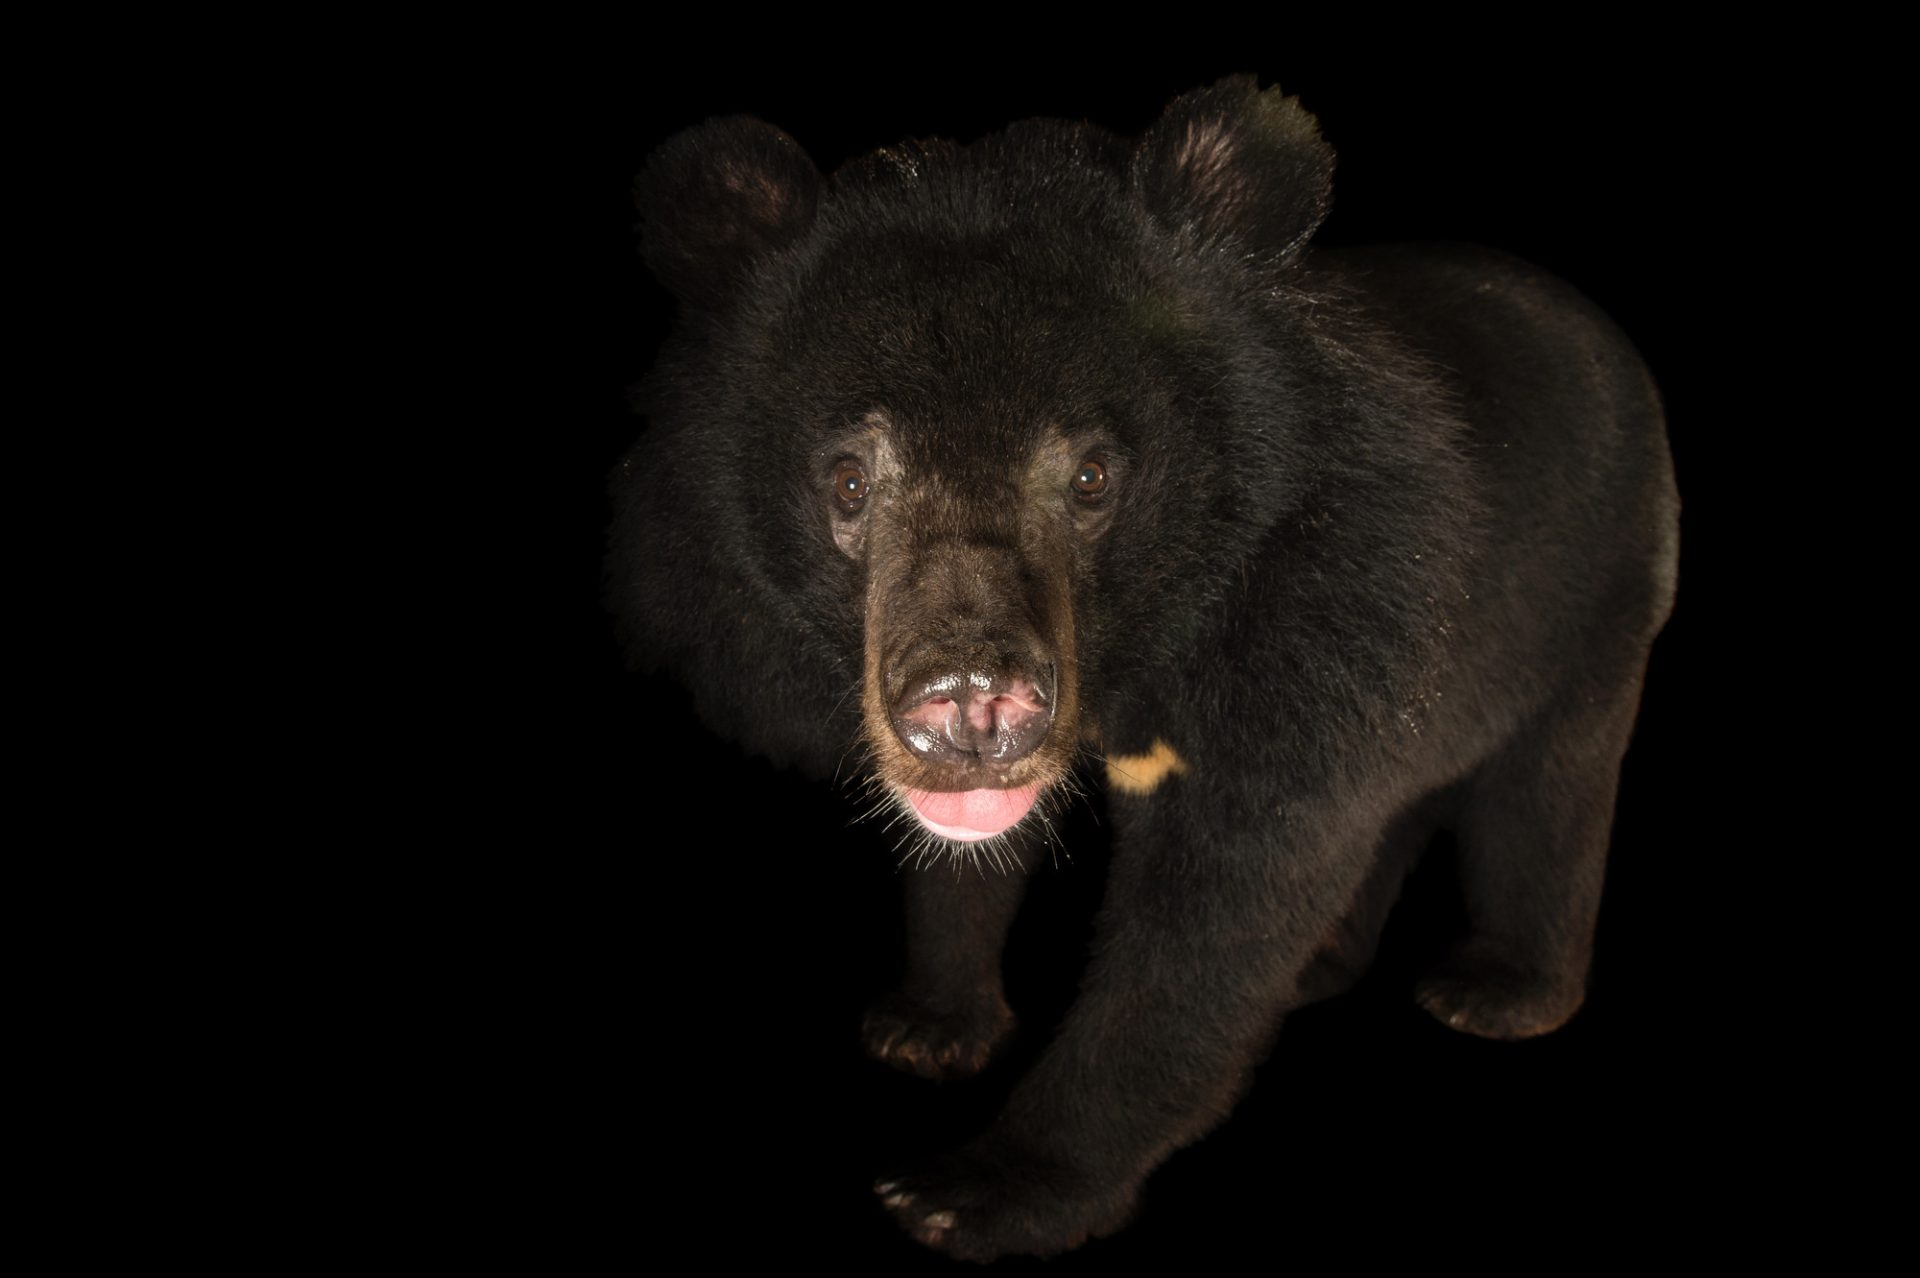 Photo: An Asiatic black bear (Ursus thibetanus) the Assam State Zoo cum Botanical Garden in Guwahati, Assam, India.